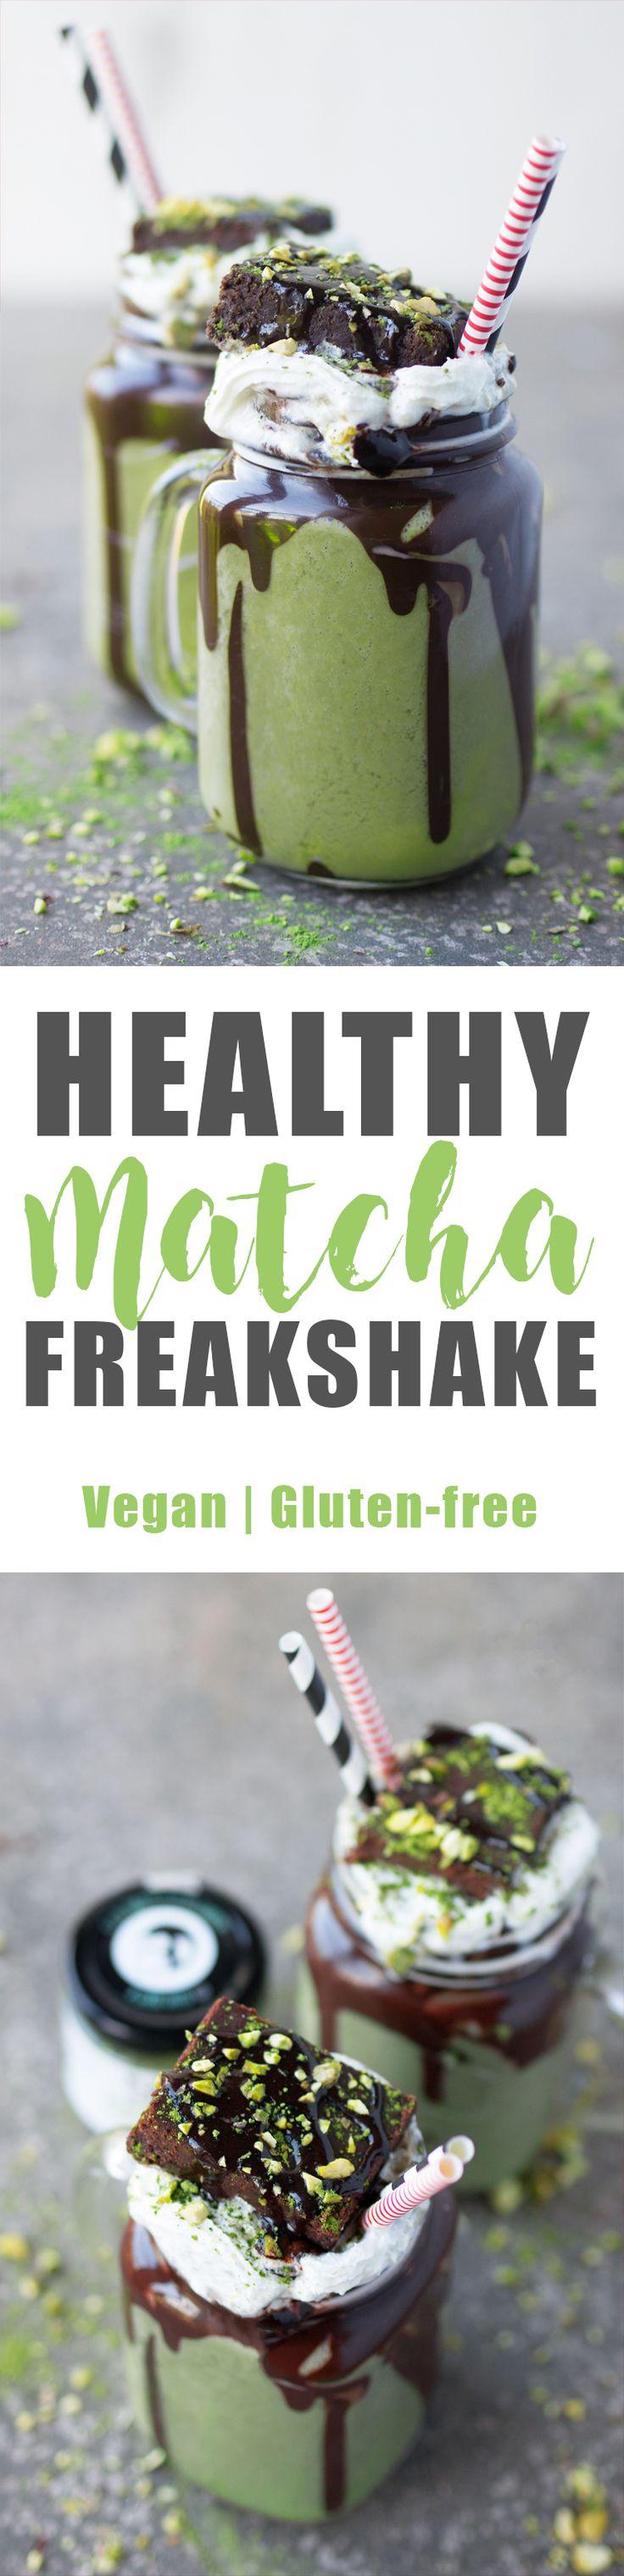 Healthy Vegan Matcha Freakshake